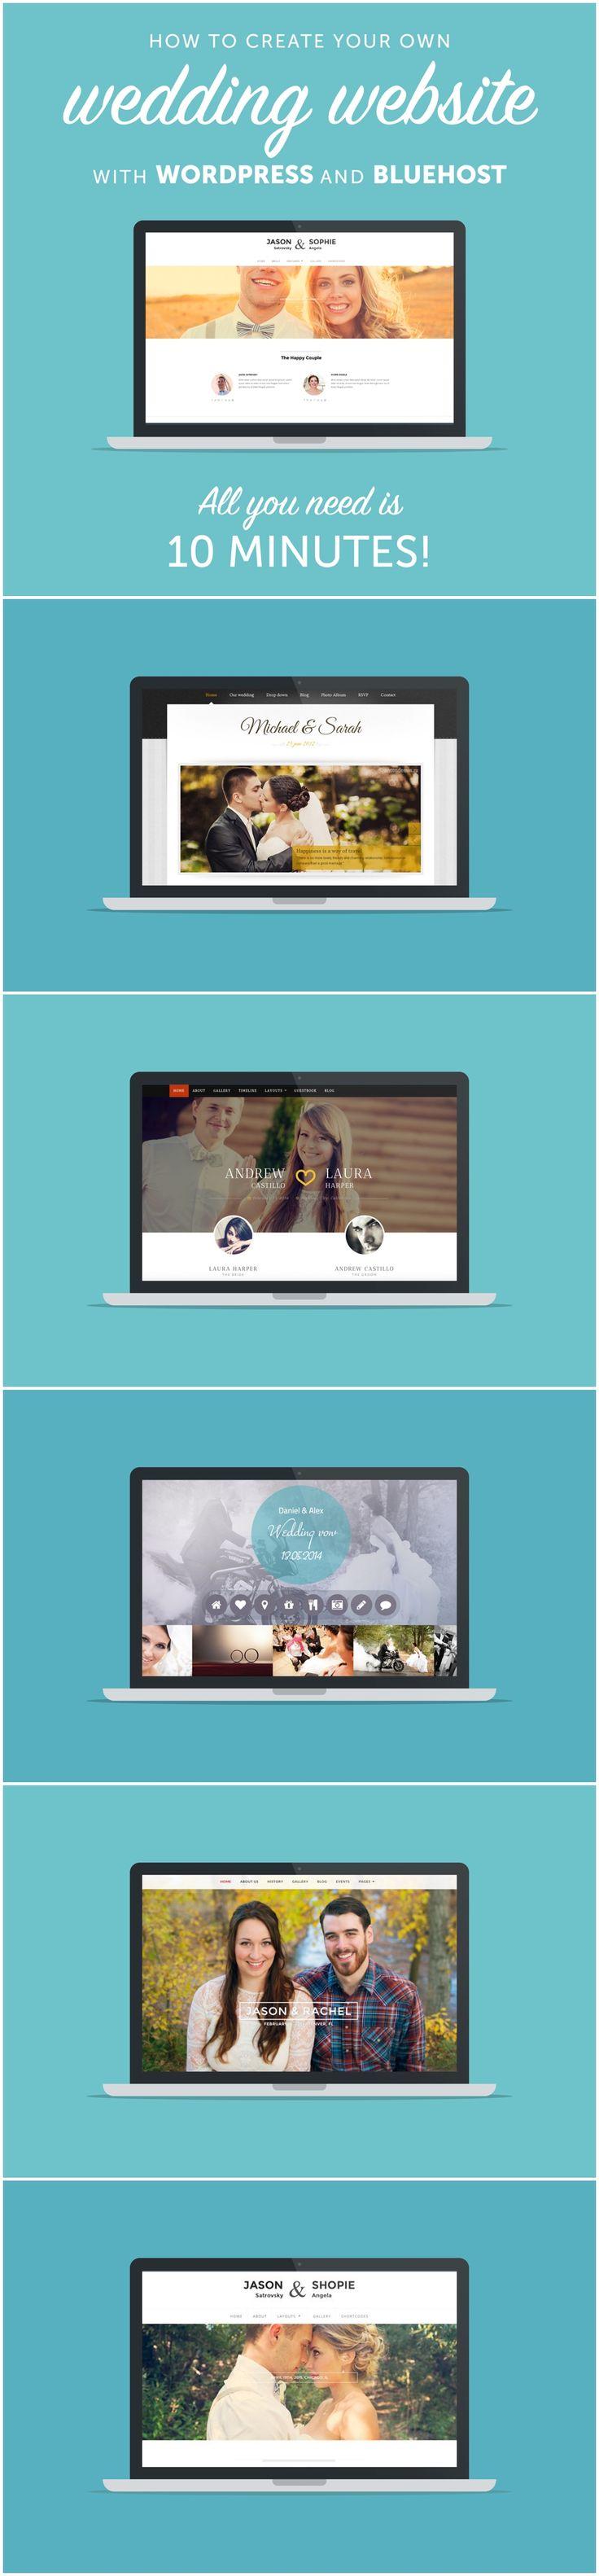 Create Your Own Wedding Website with Wordpress